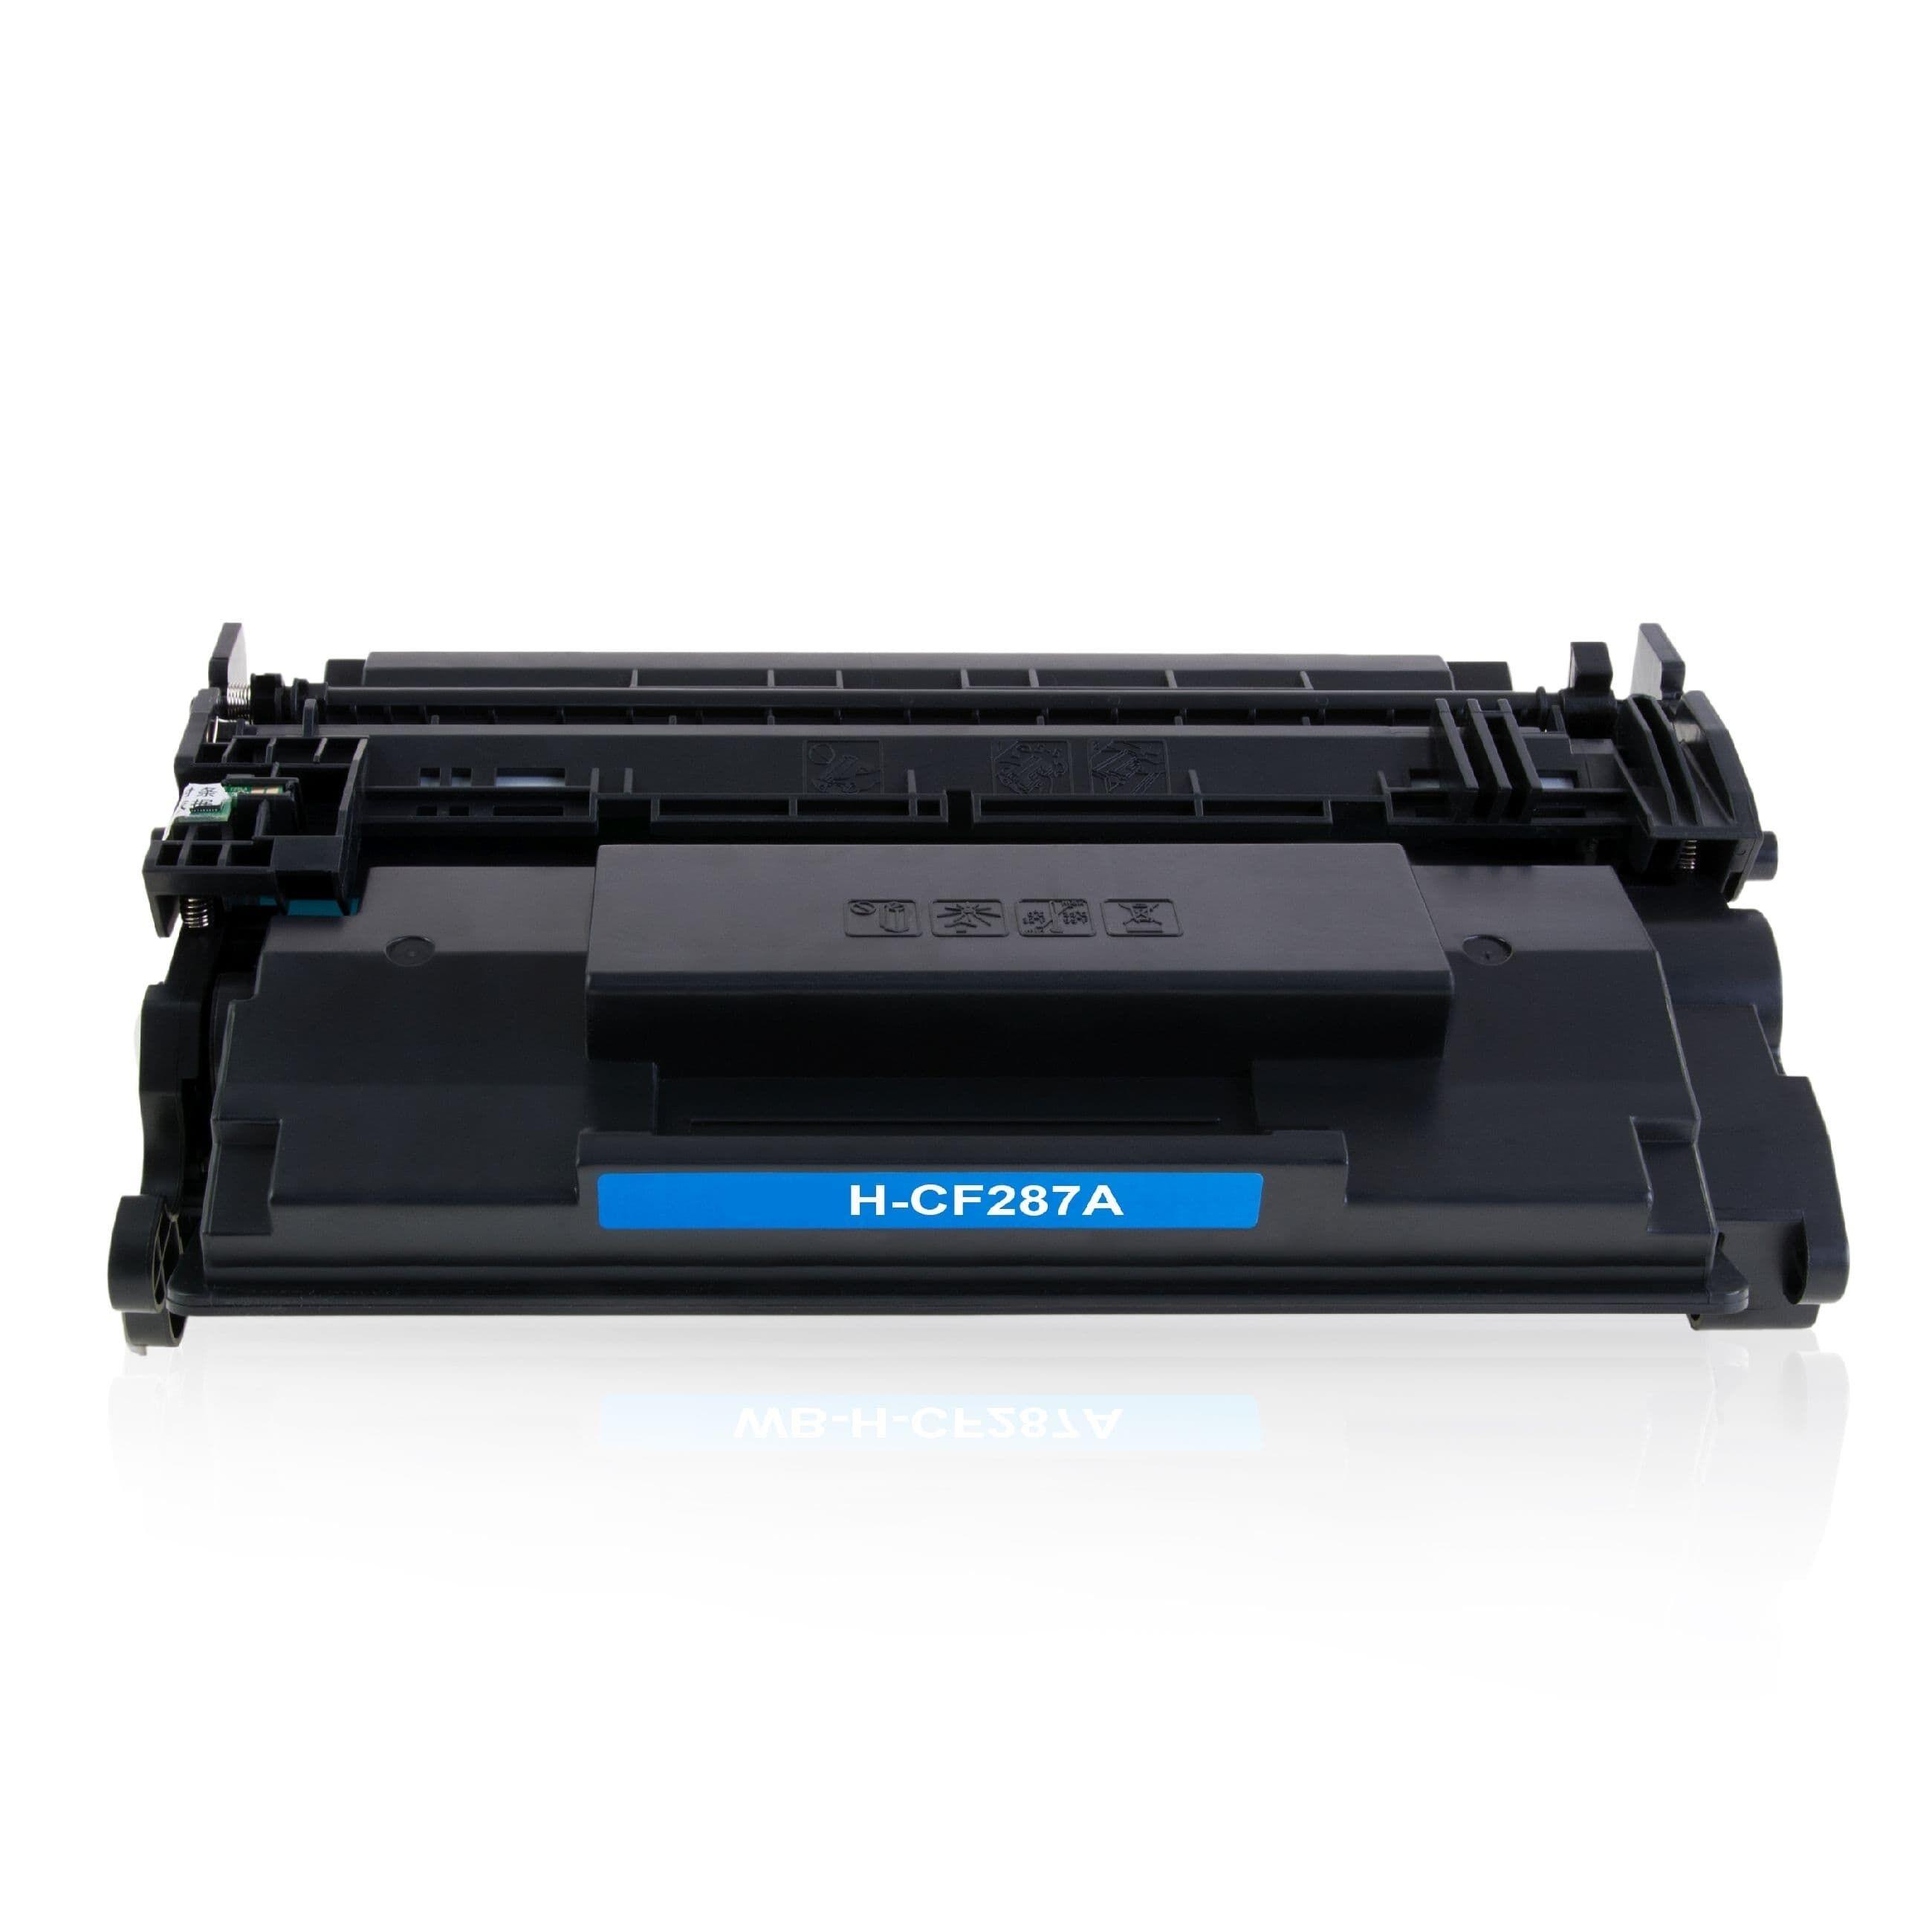 HP Cartouche de Toner pour HP CF287A / 87A noir compatible (de marque ASC)